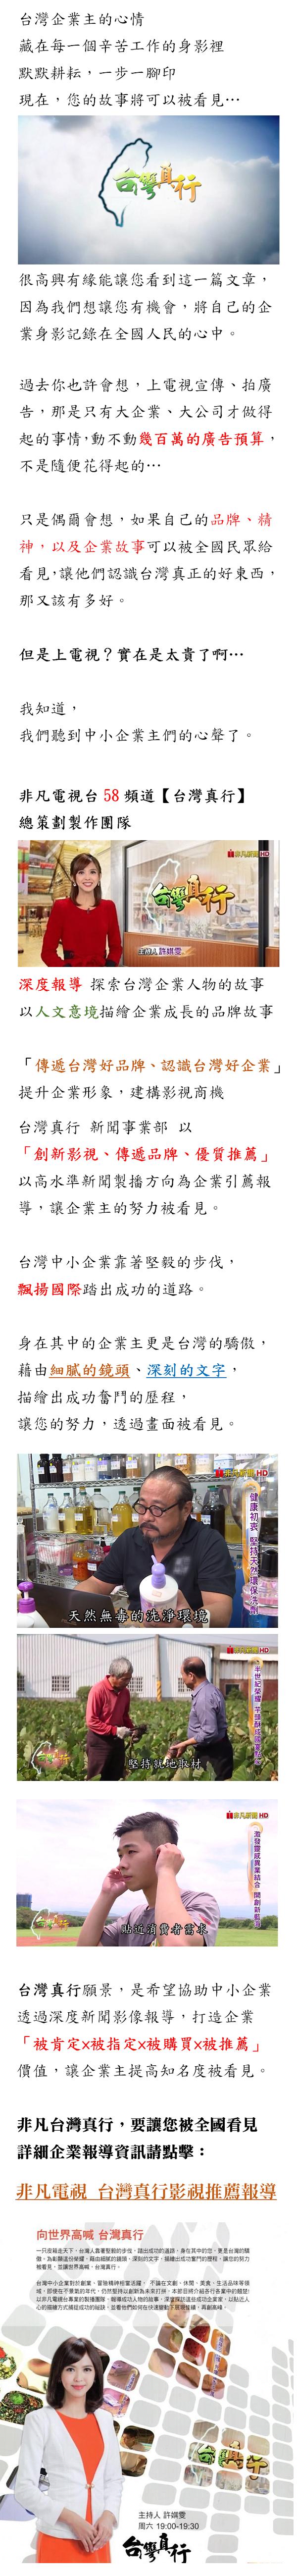 taiwanmore01